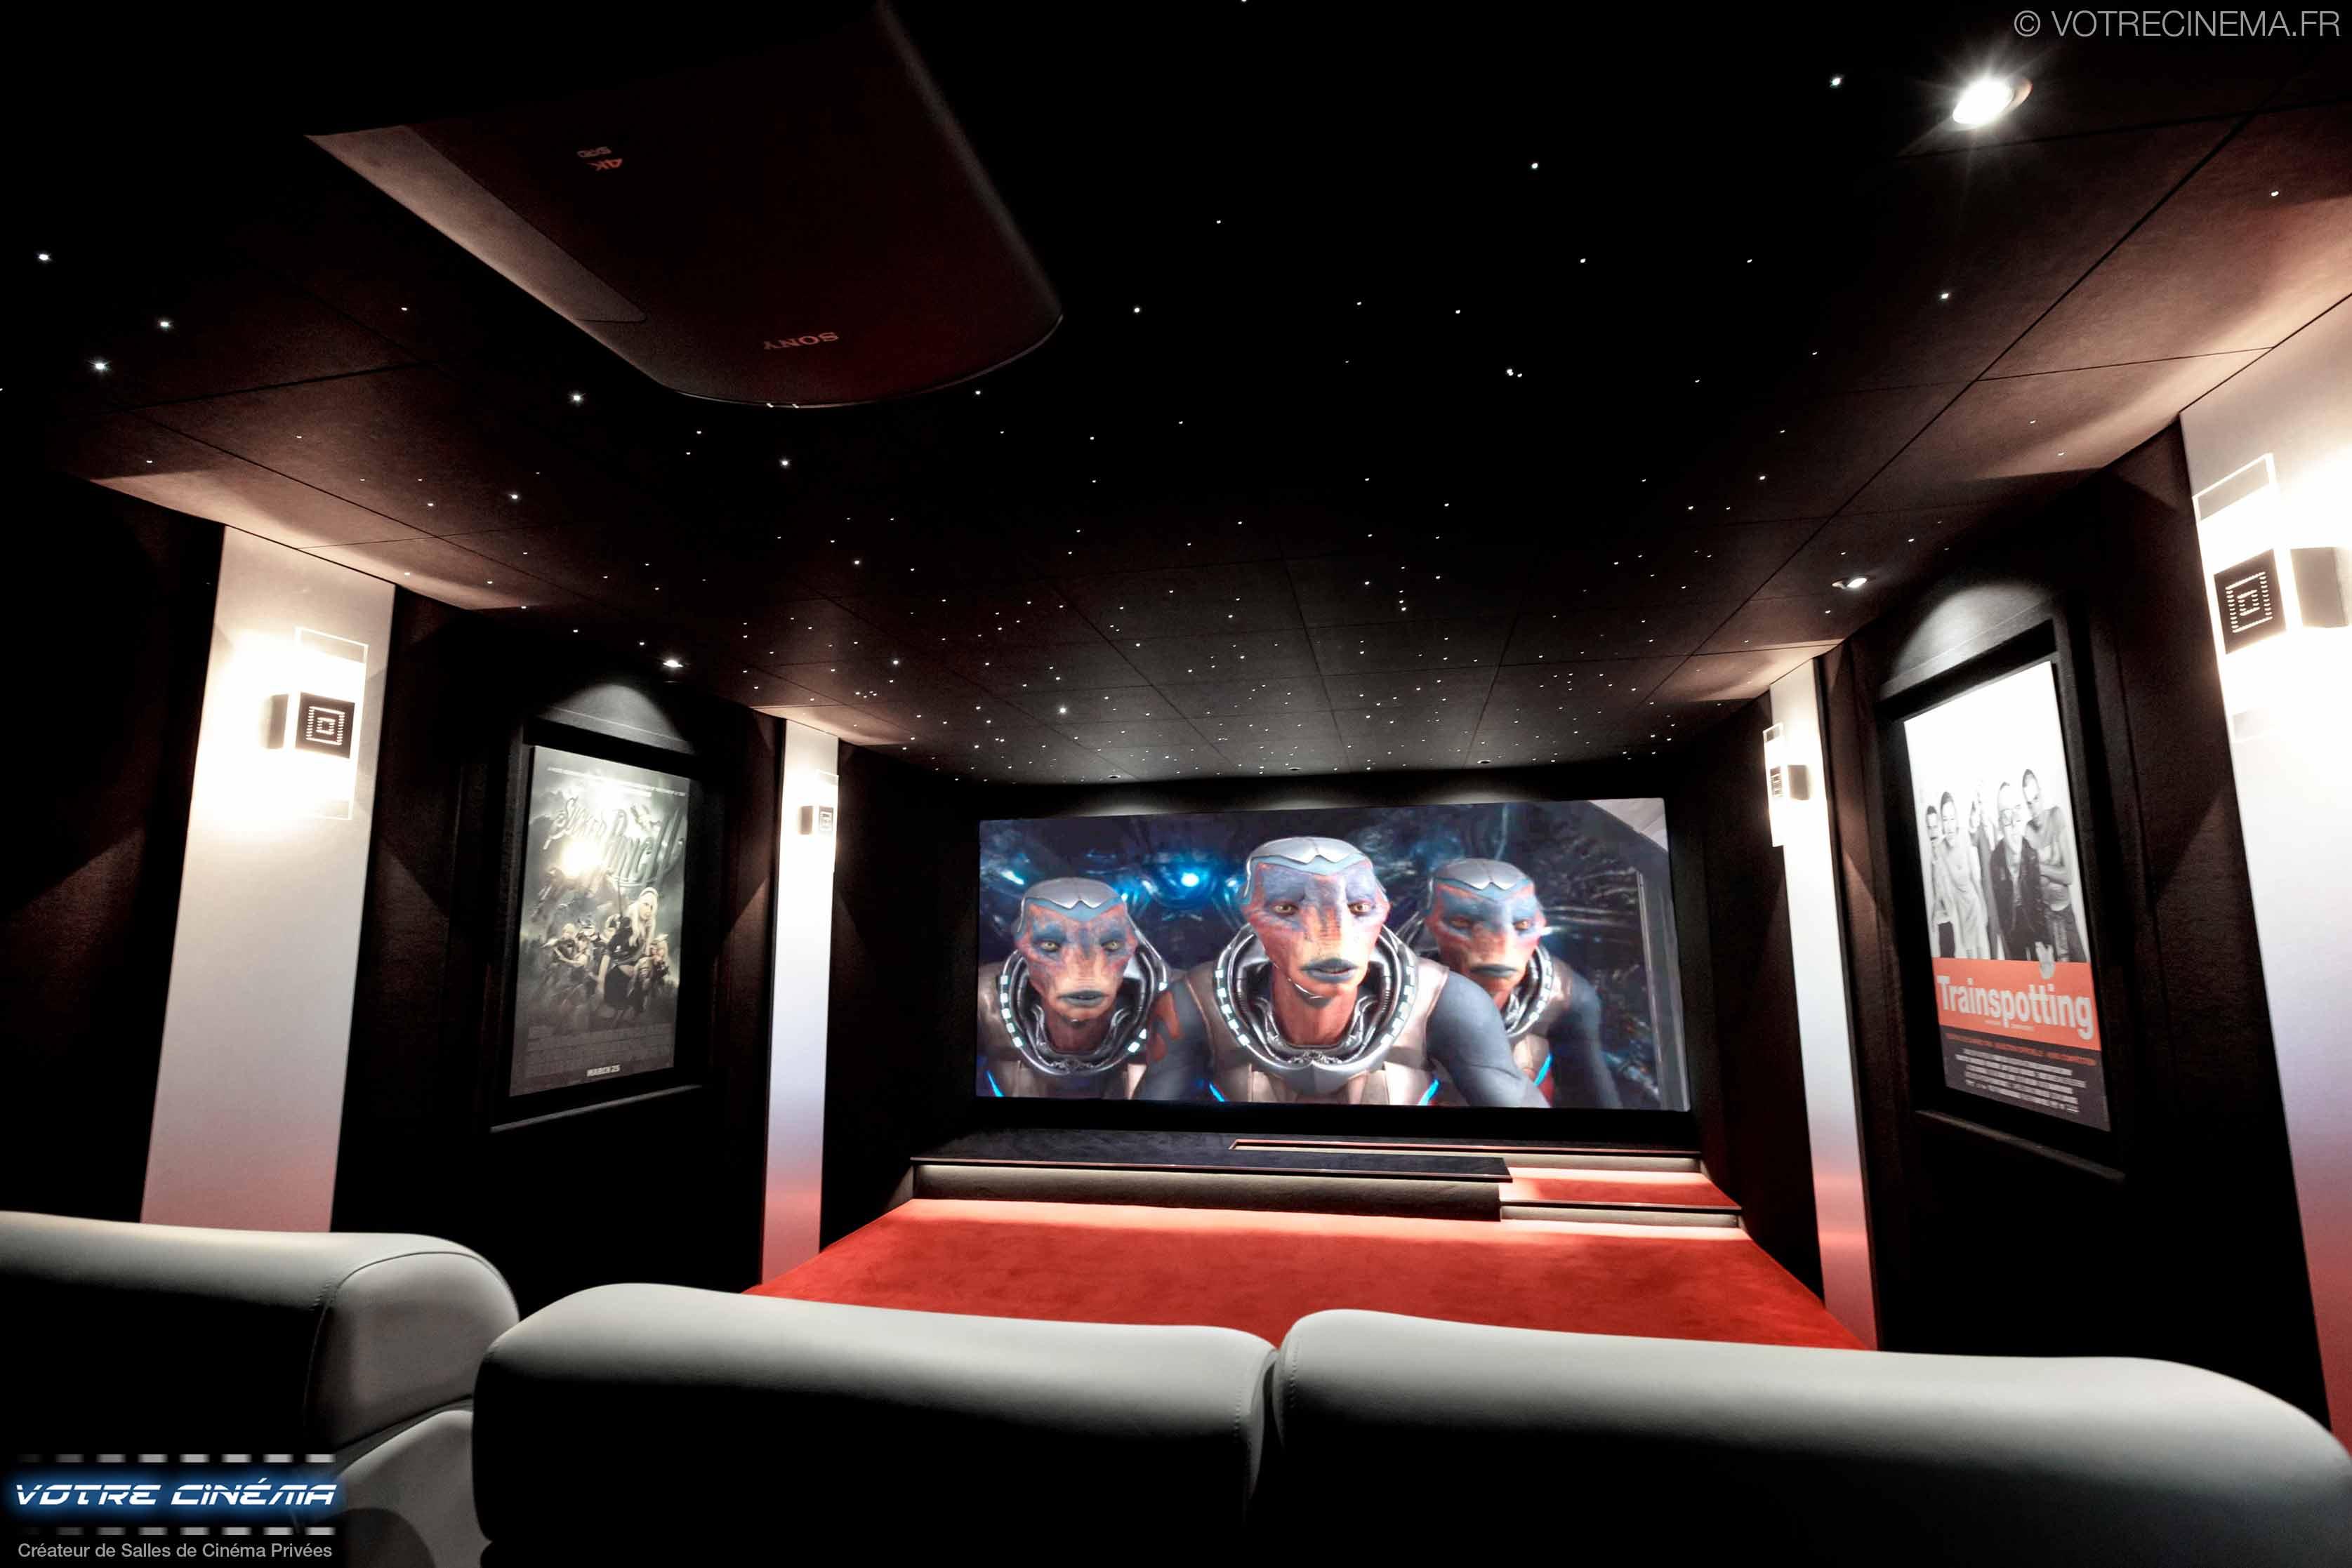 Installation salle de cinéma privée mulhouse